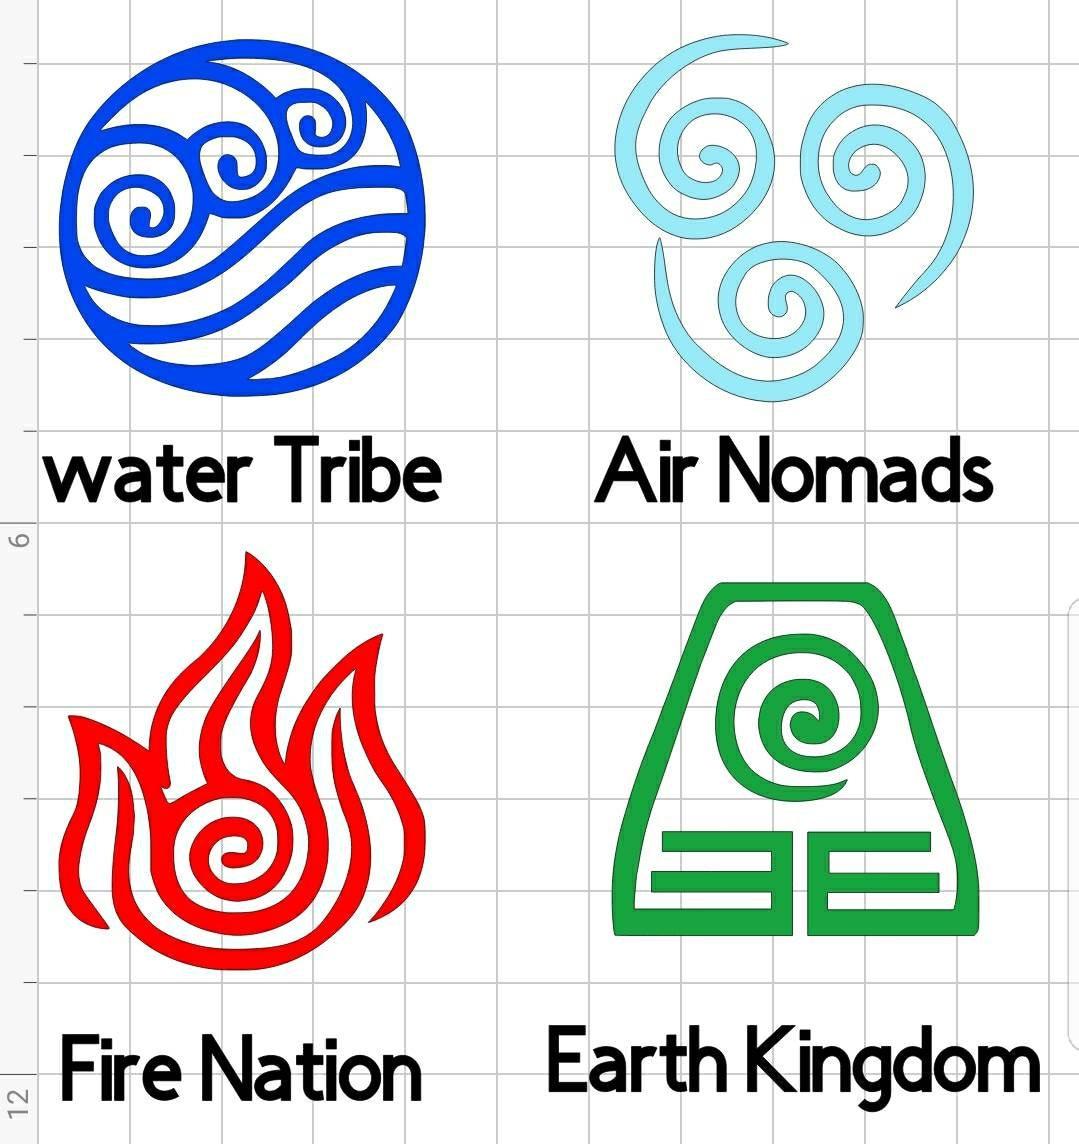 Avatar inspired the last airbender legend of korra nation zoom biocorpaavc